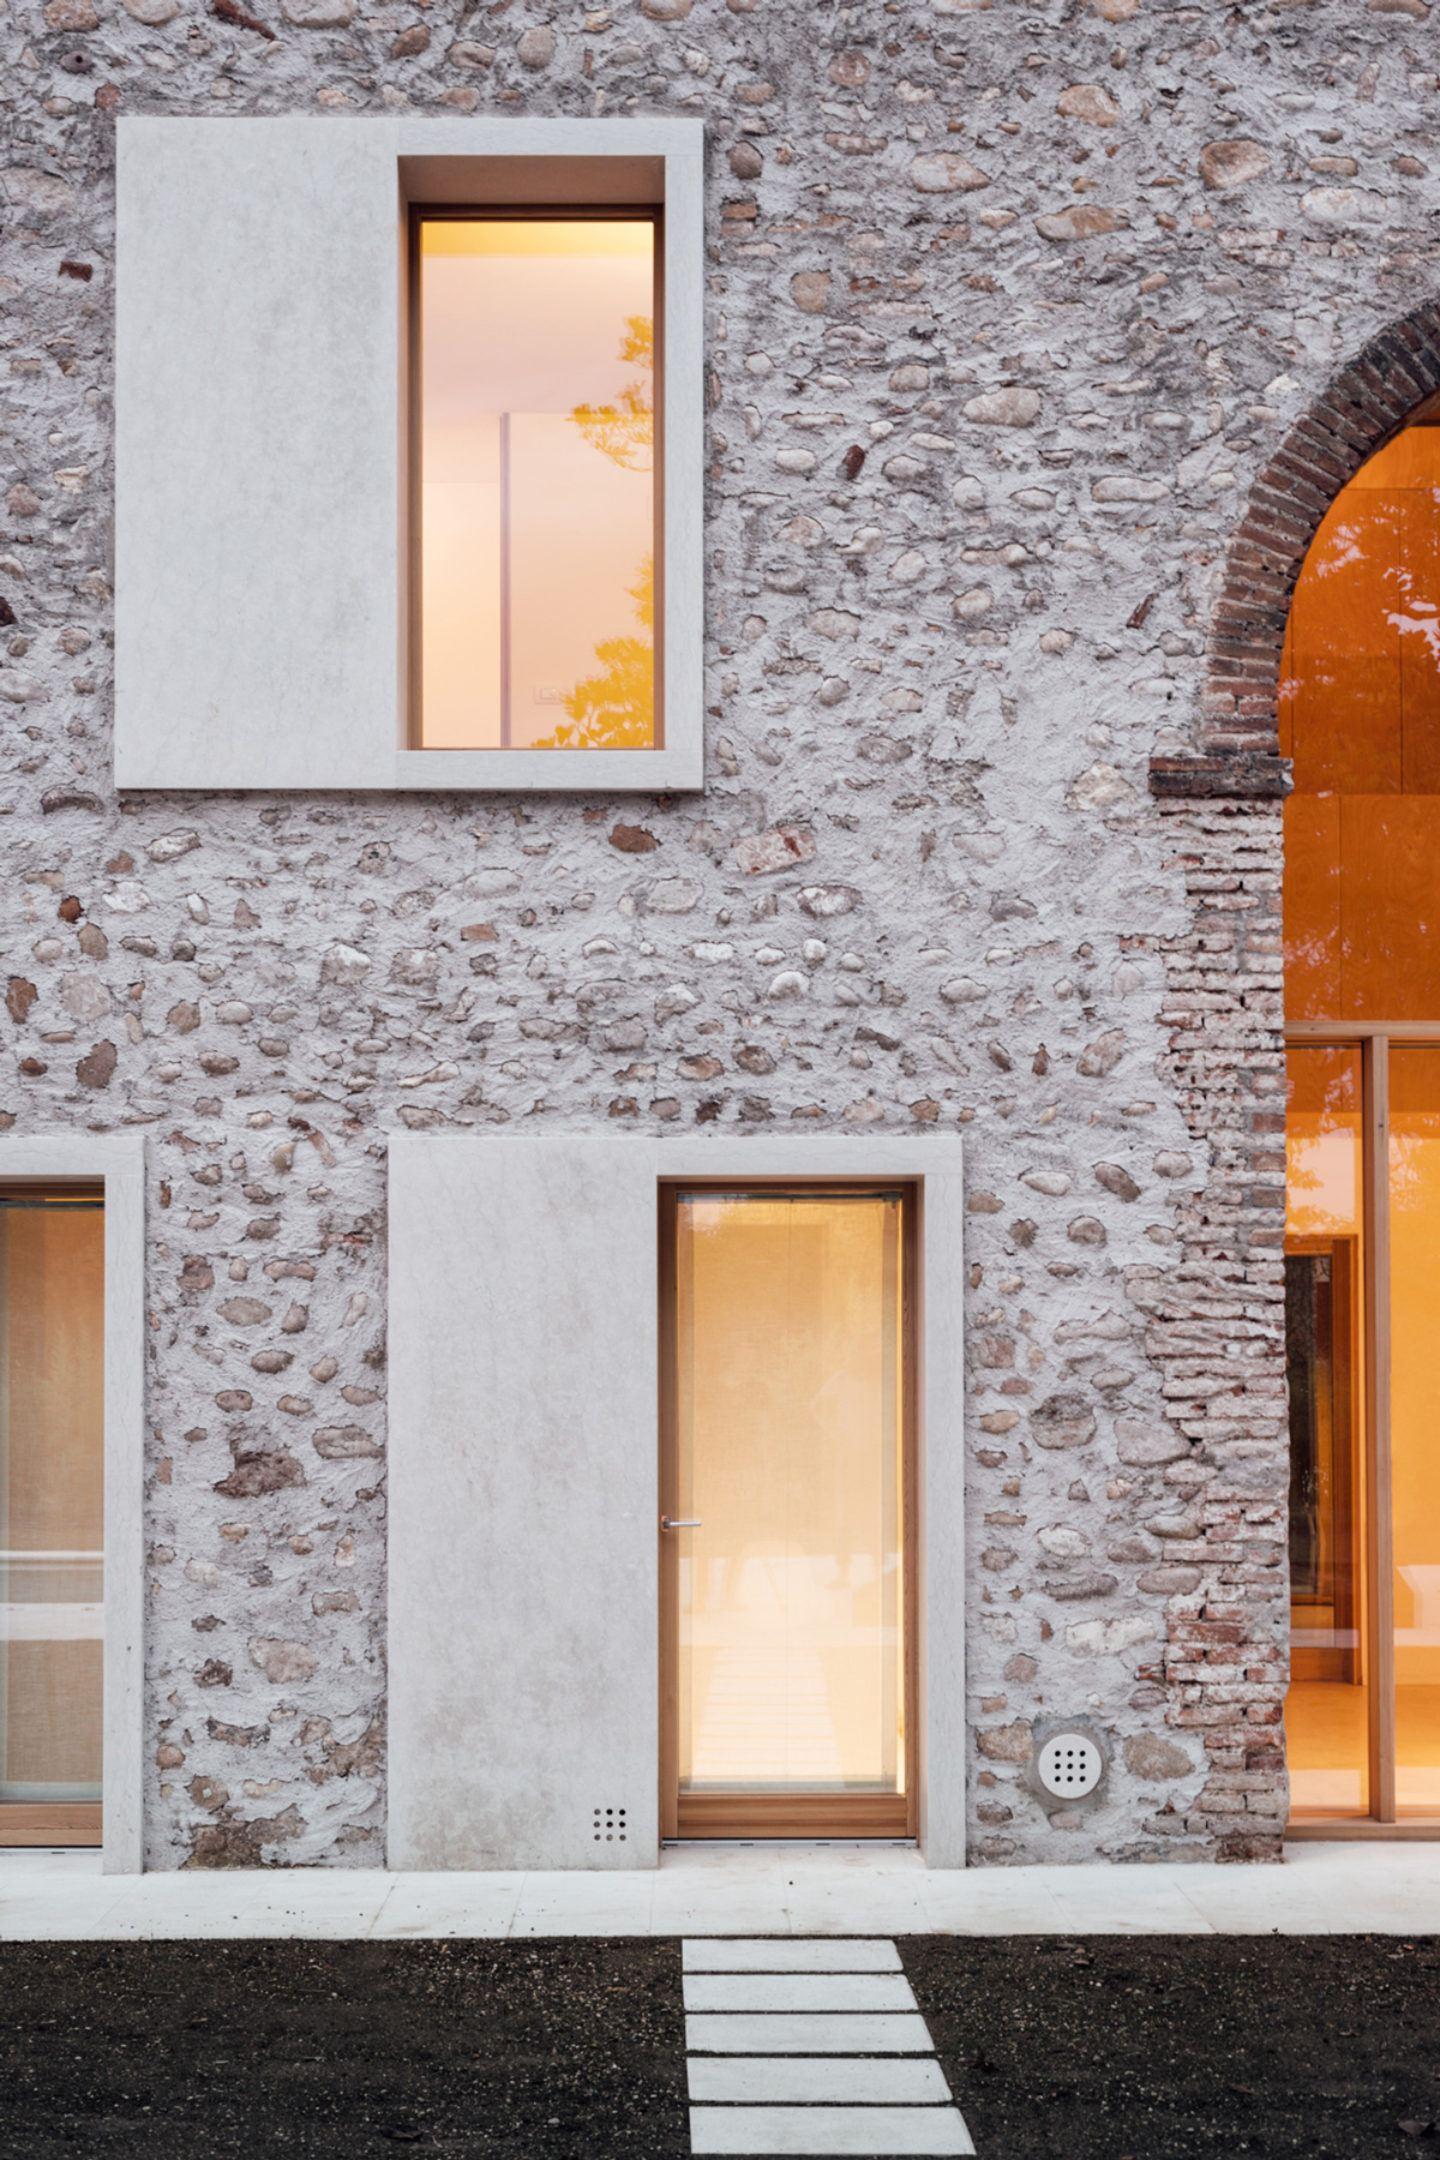 IGNANT-Architecture-Studio-Wok-Country-Home-In-Chievo-25